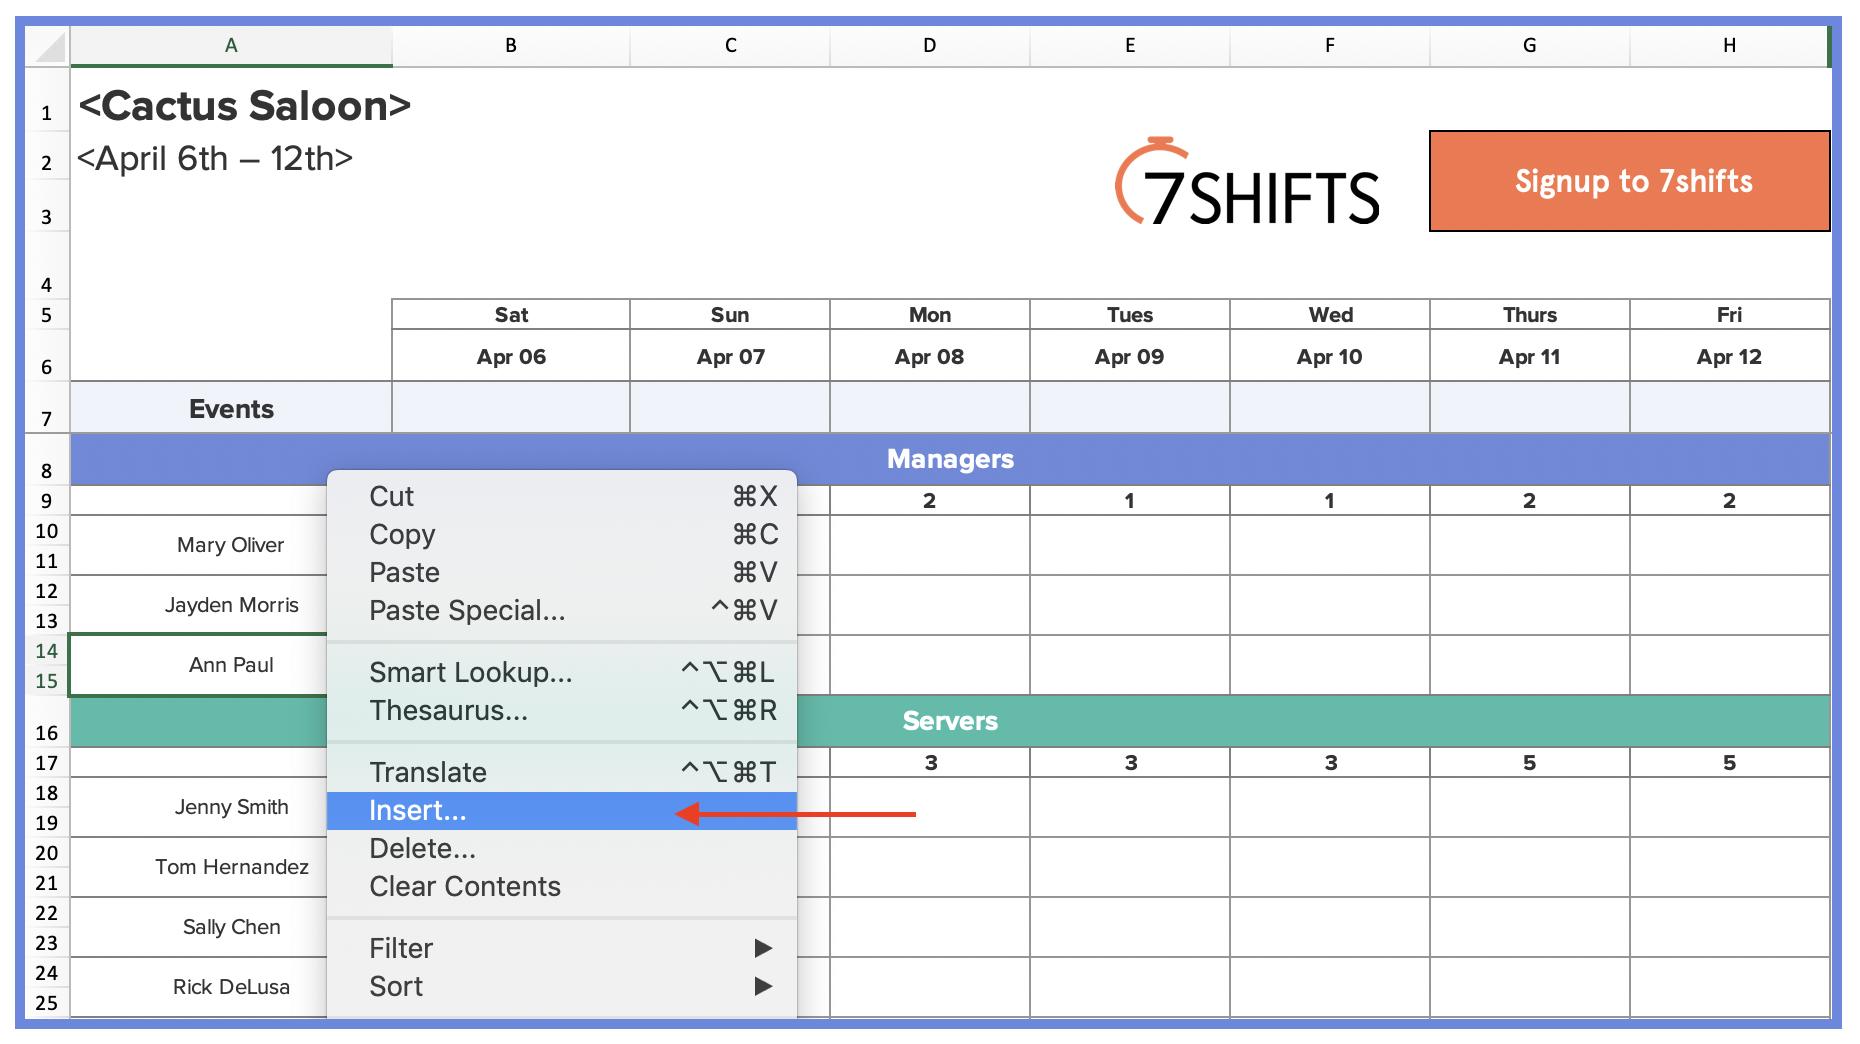 6-restaurant-scheduling-excel-template